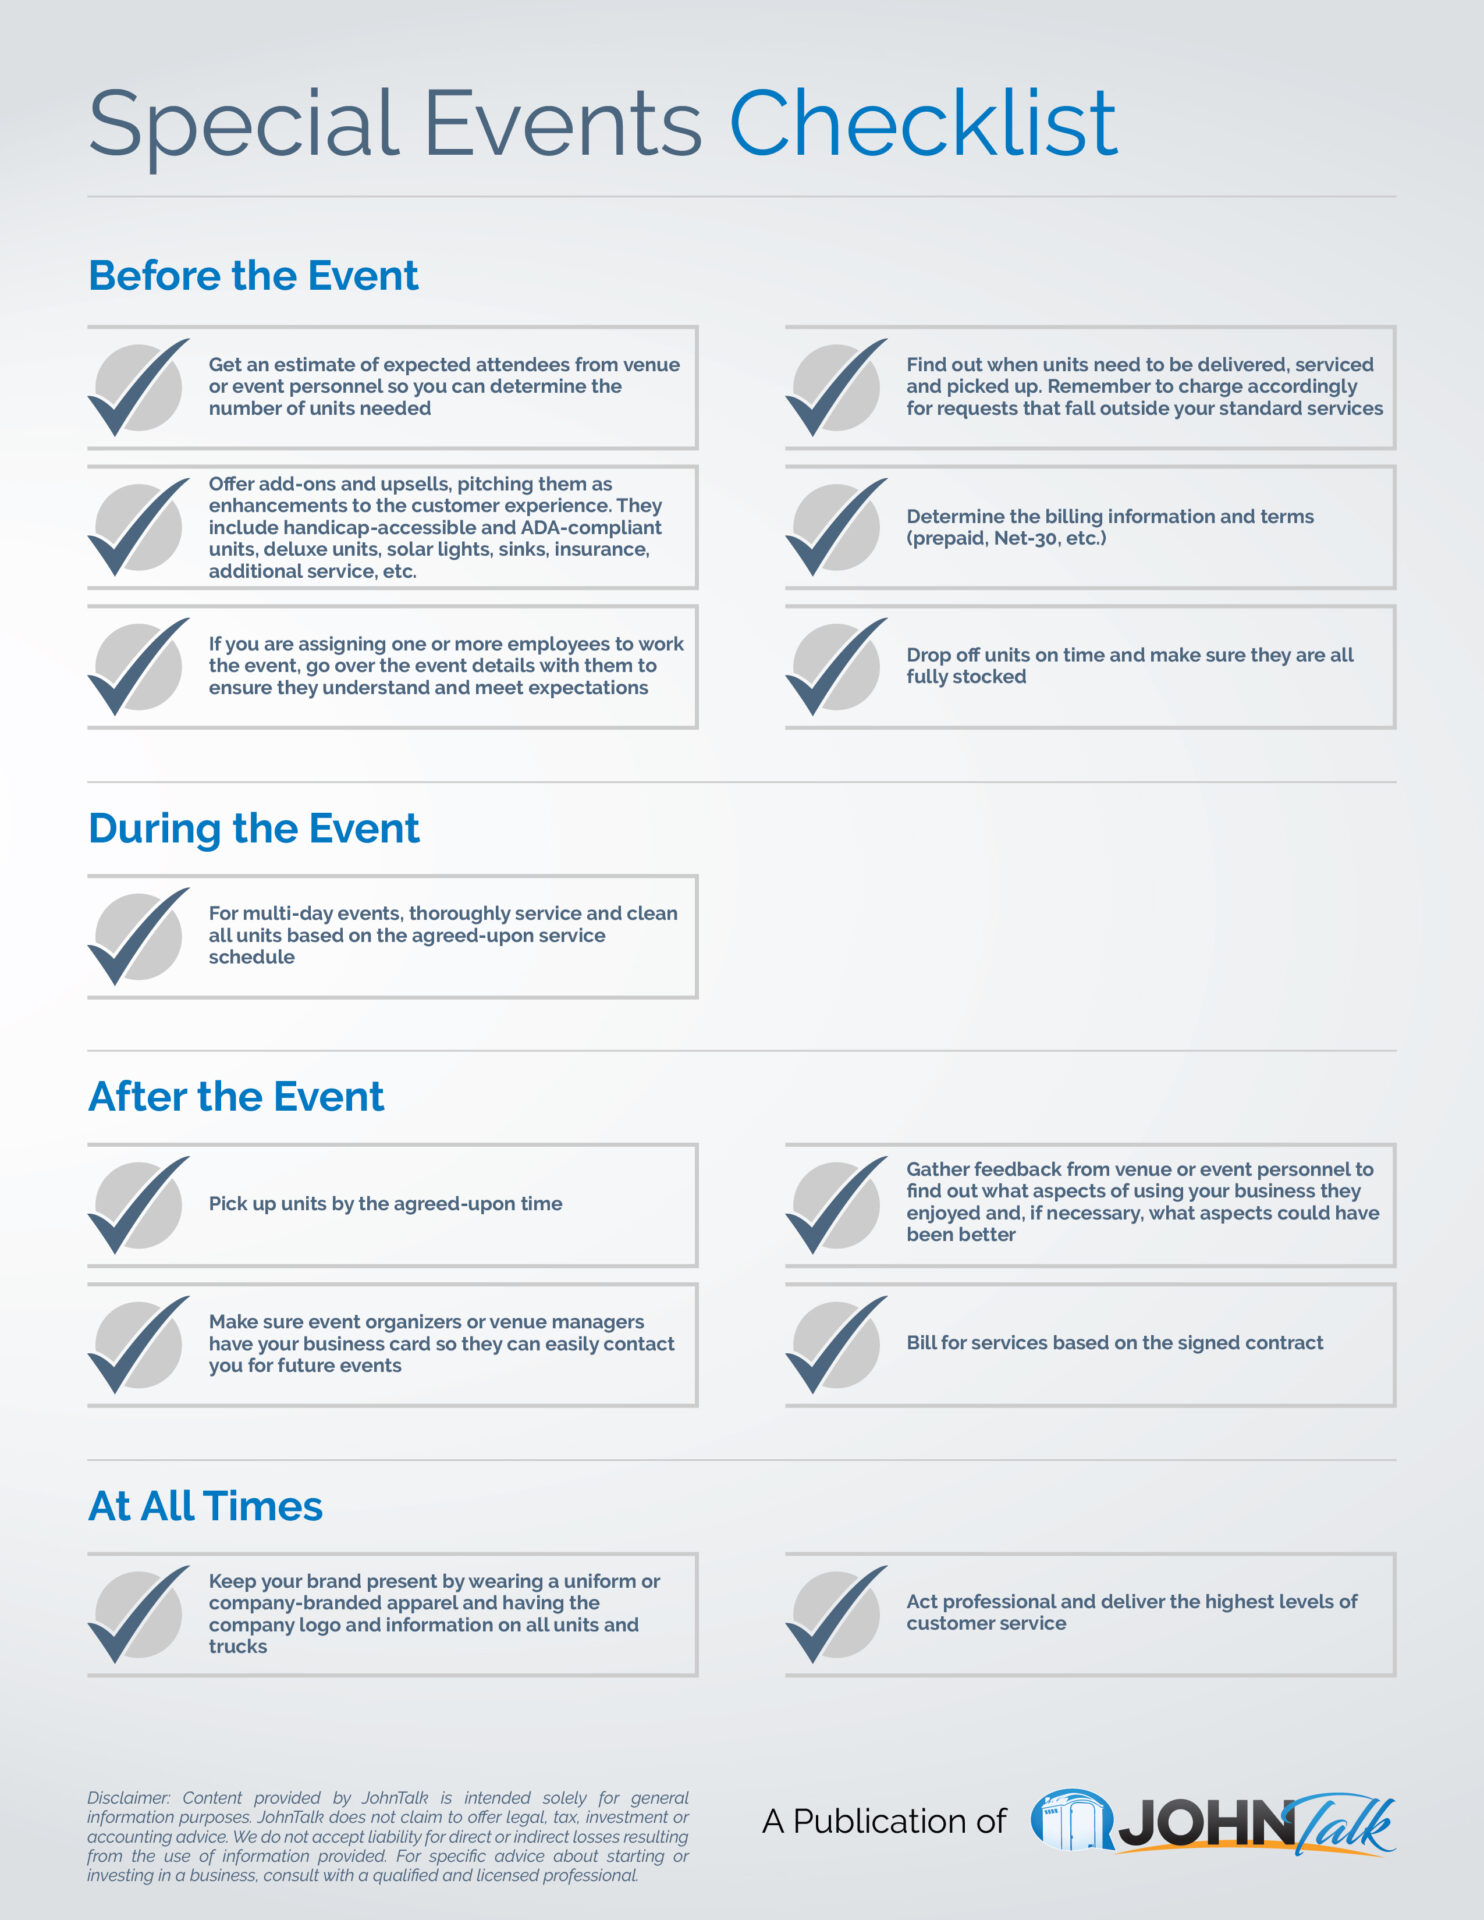 Special Events Checklist